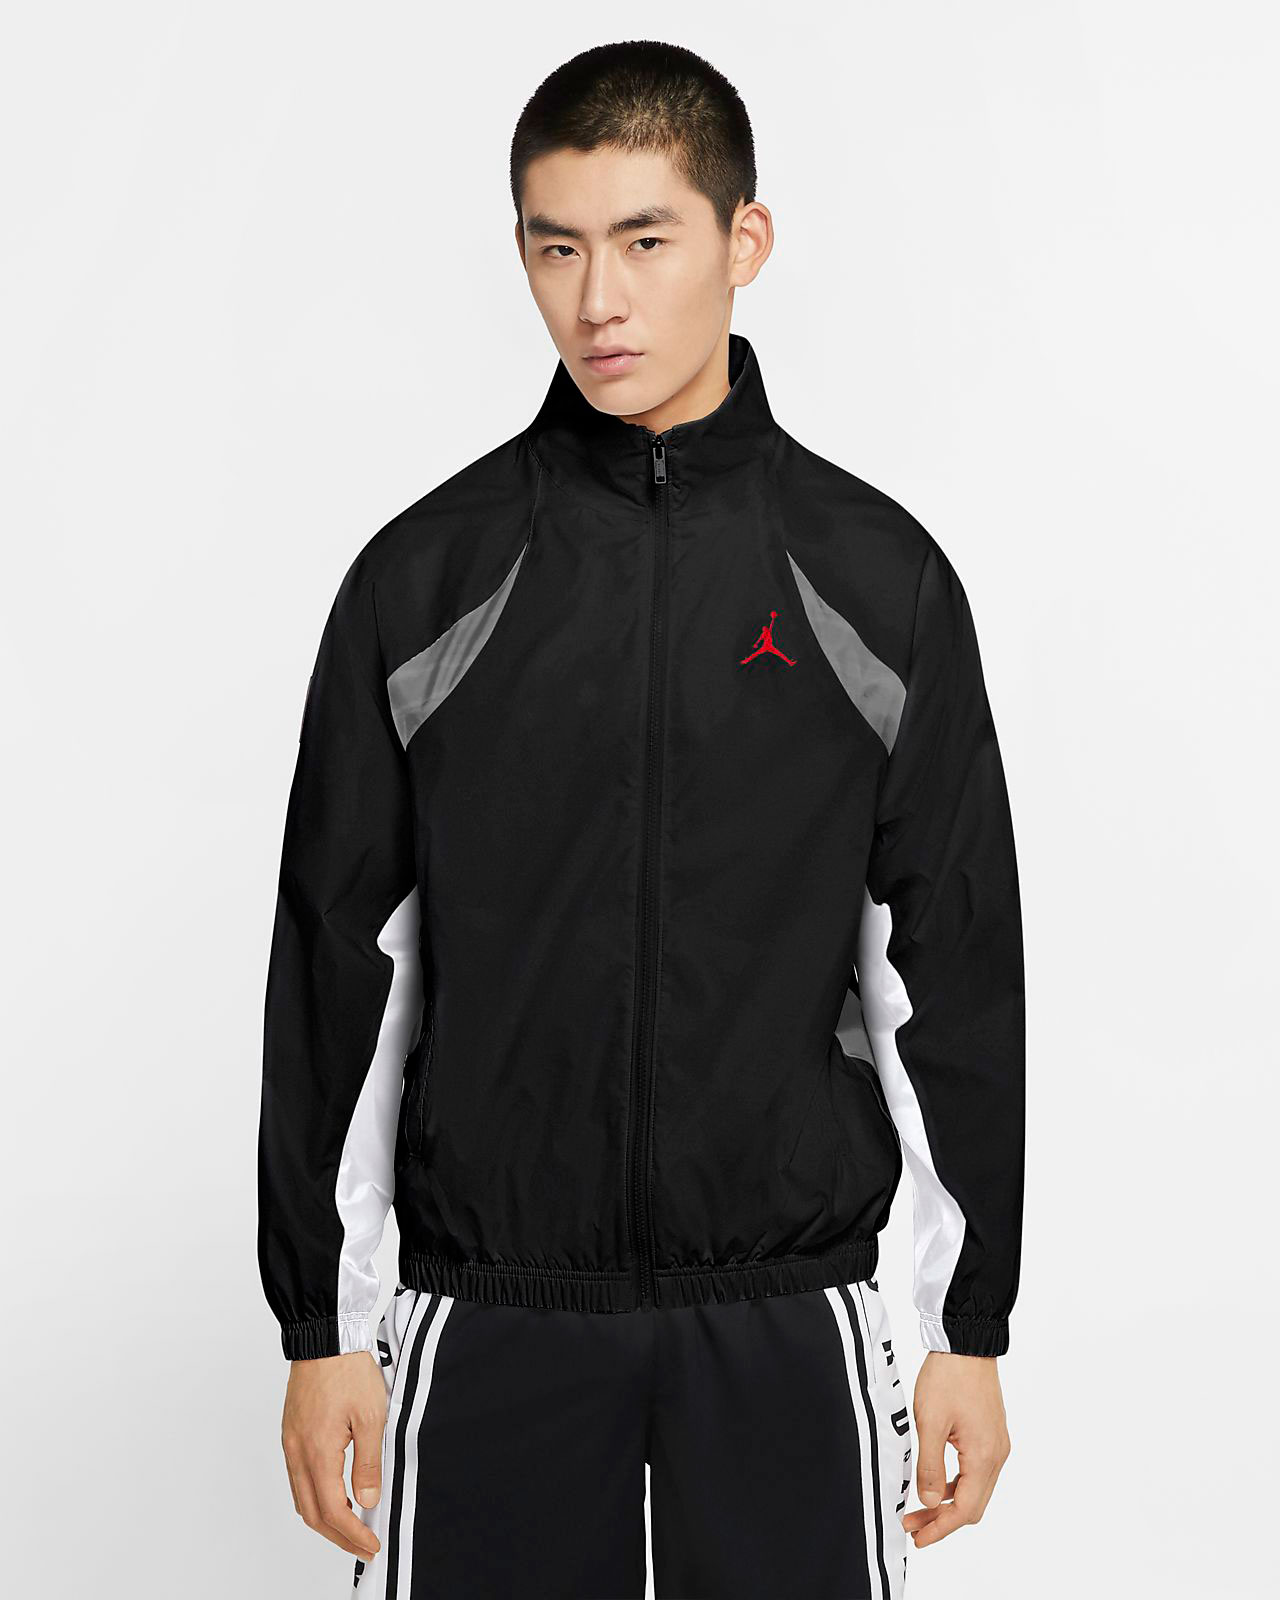 air-jordan-11-concord-bred-jacket-black-1